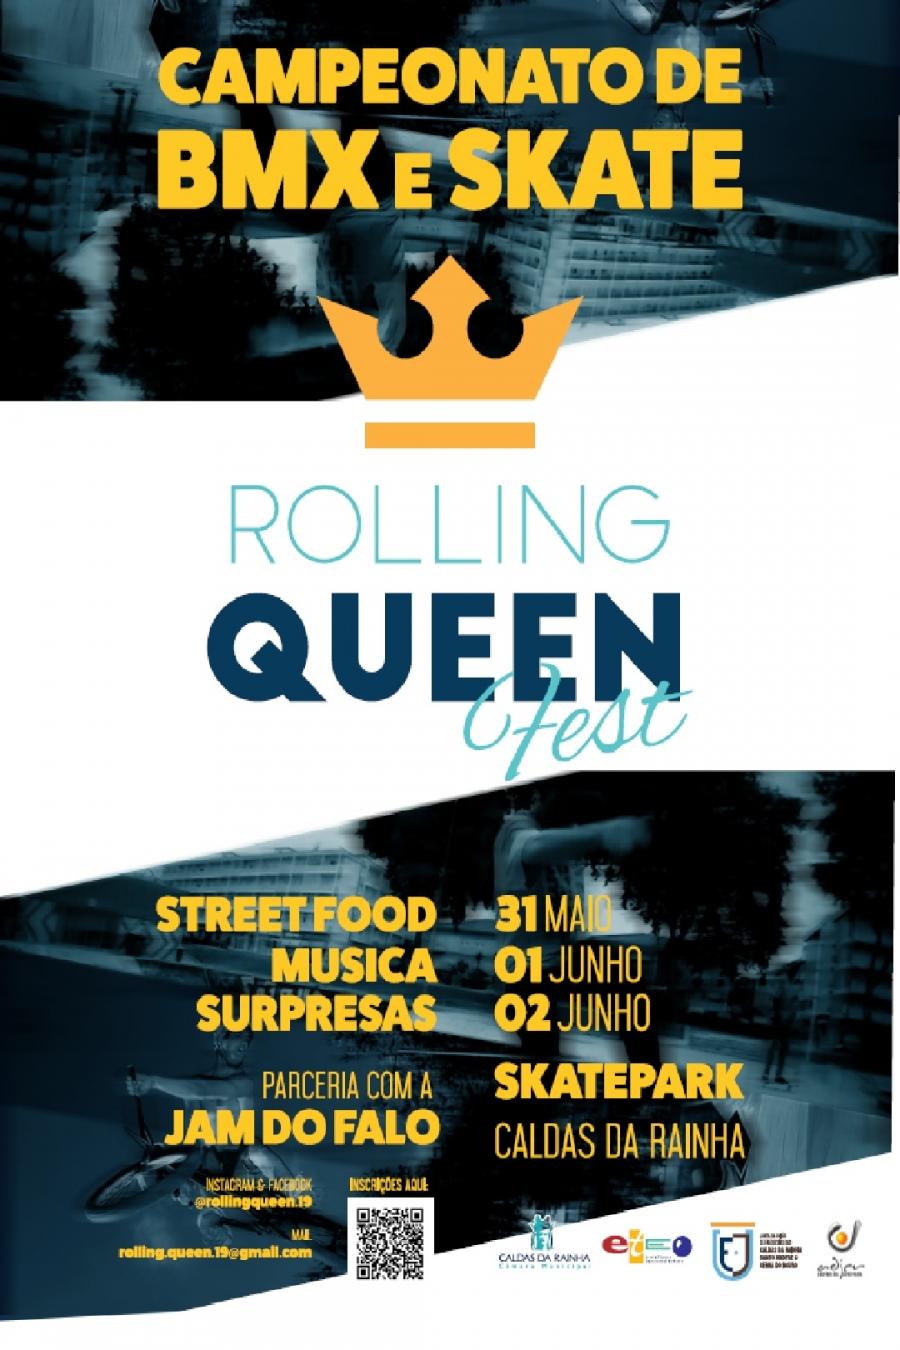 Rolling Queen Fest - Campeonato de BMX e Skate